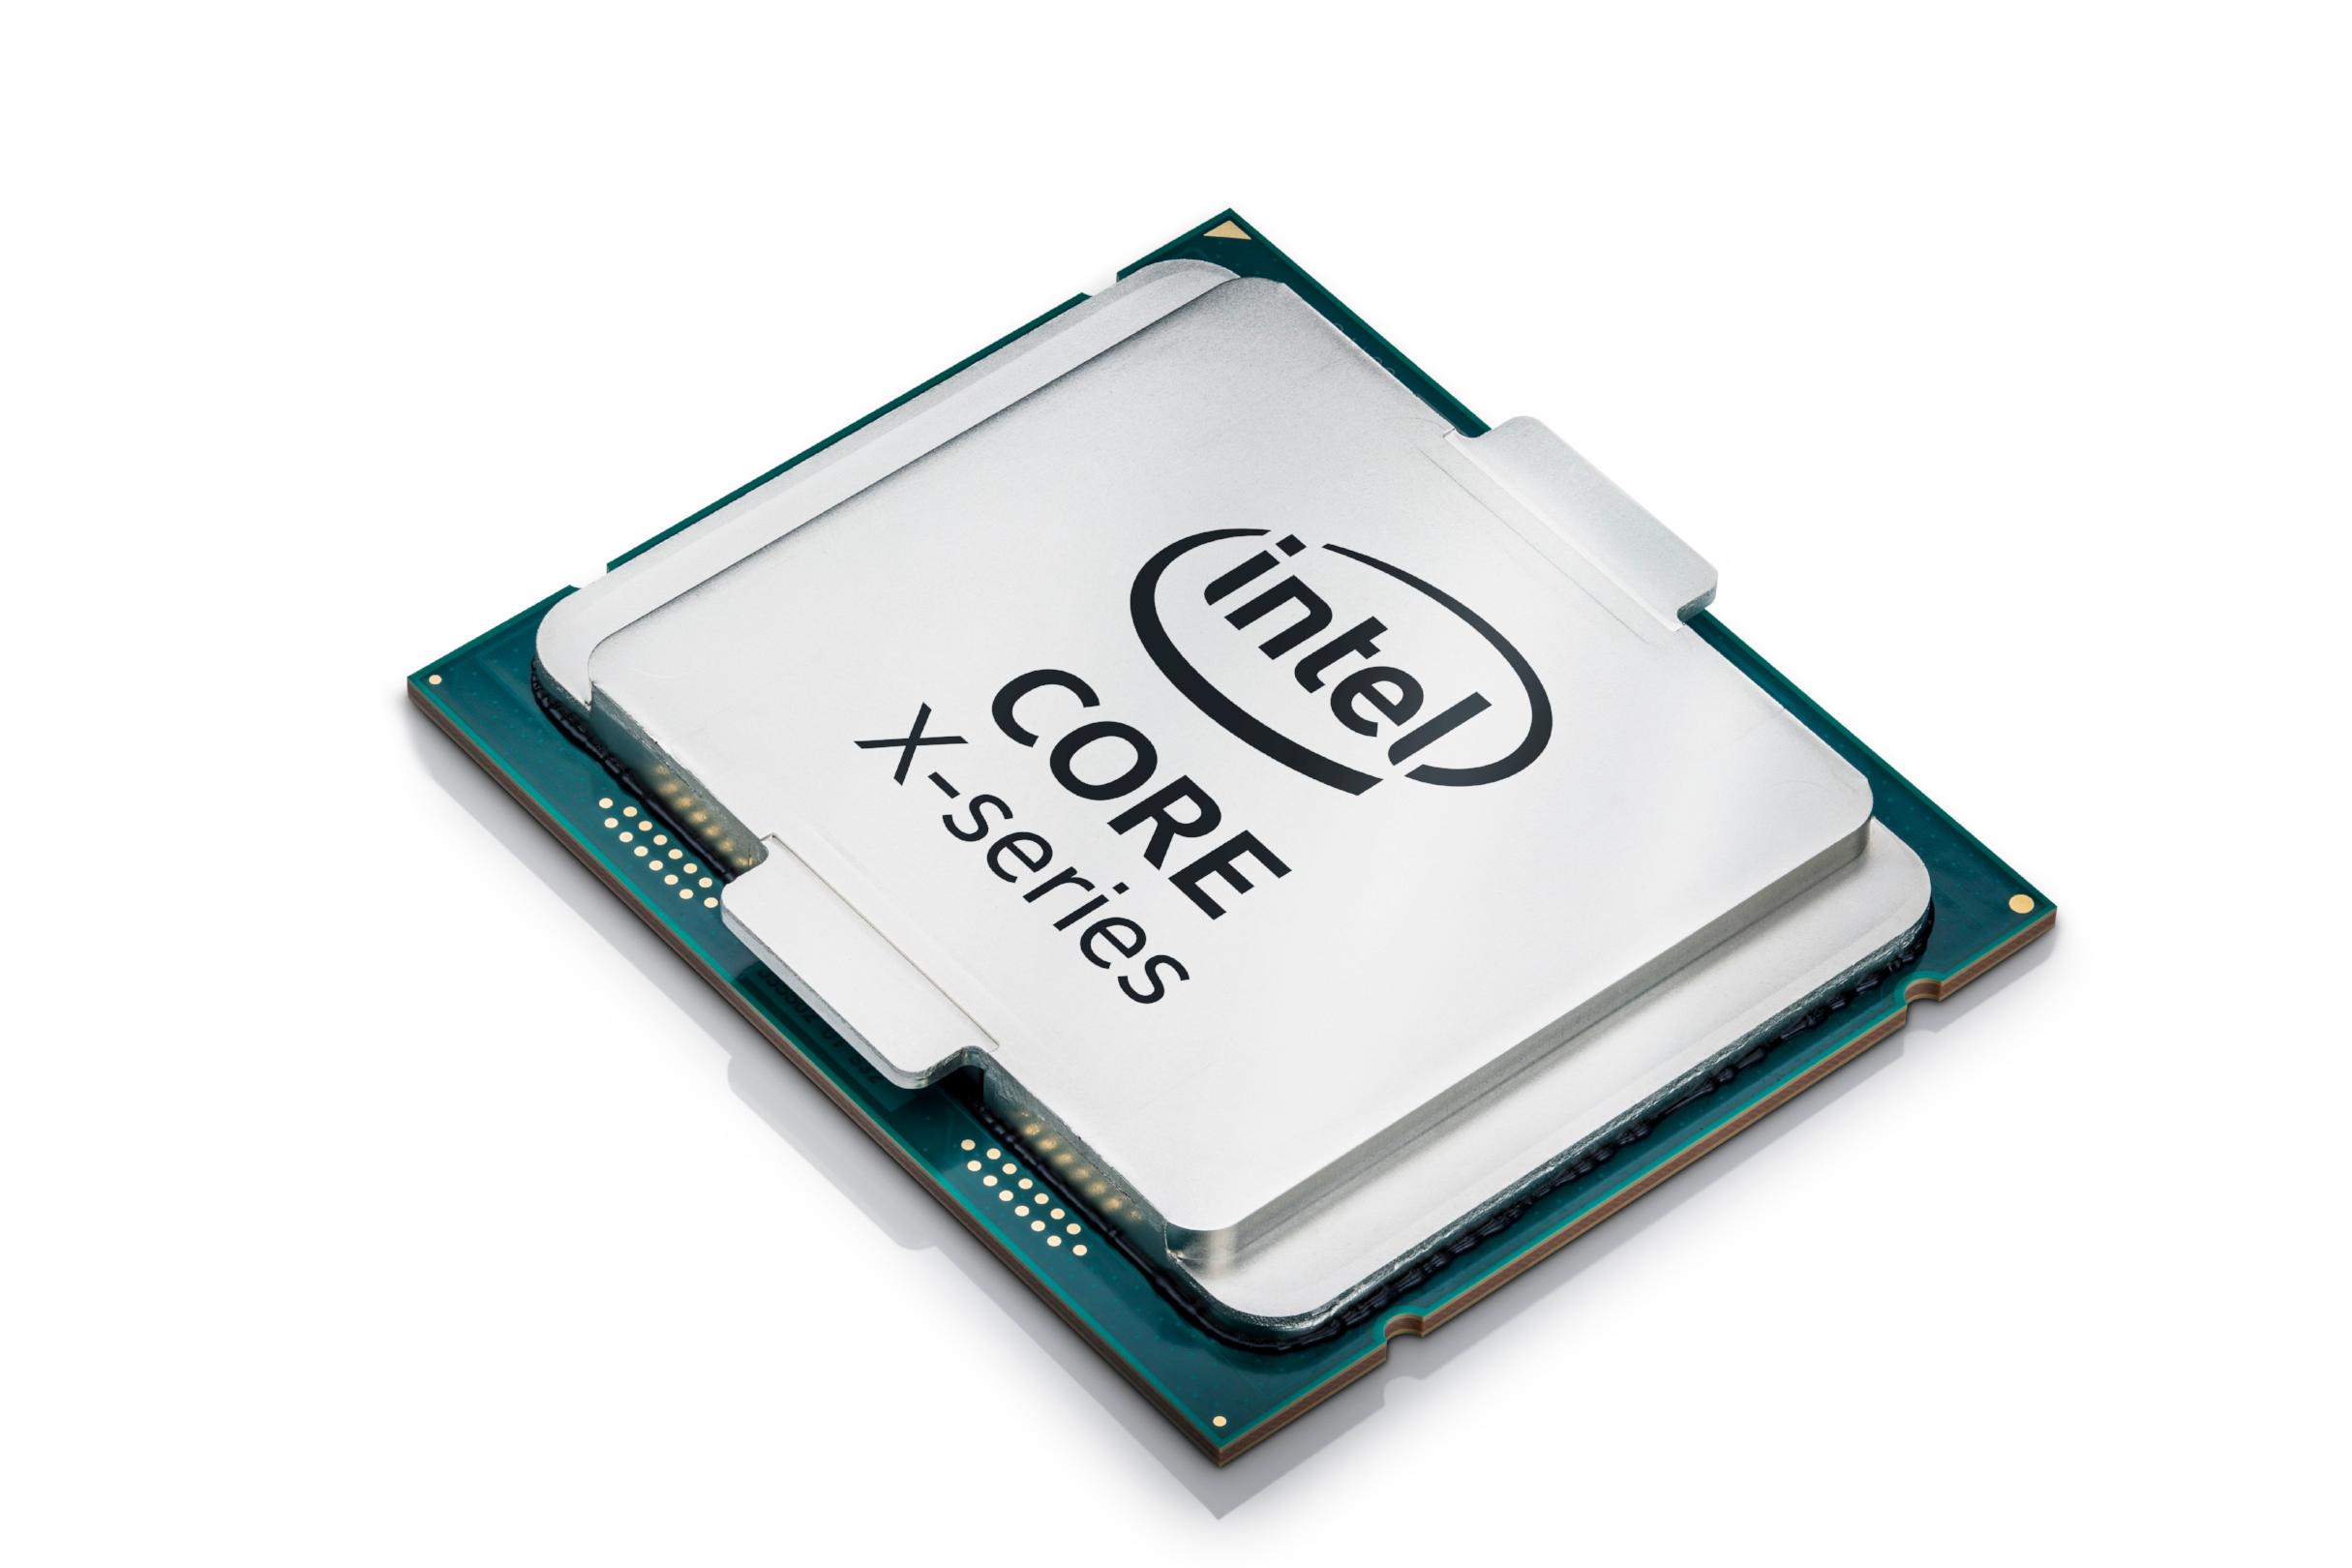 An Intel Core X-series chip, laid out on a plain white backdrop.